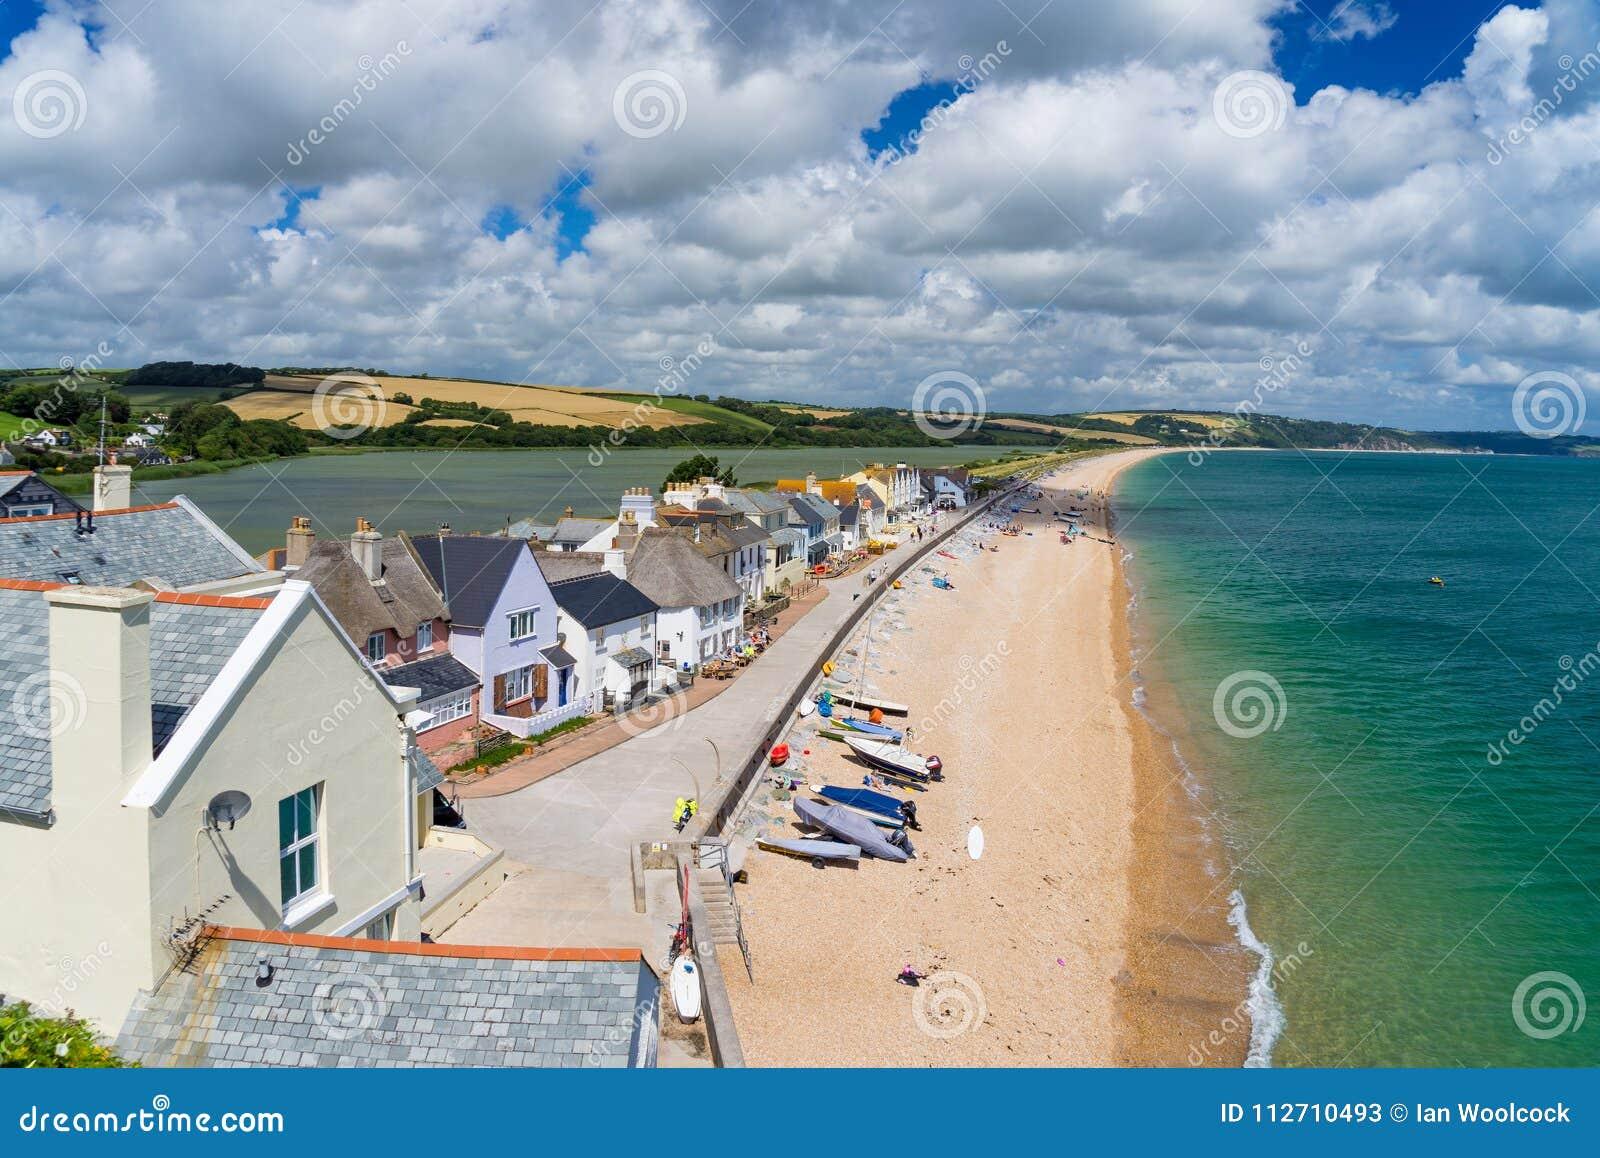 Torcross Devon England UK